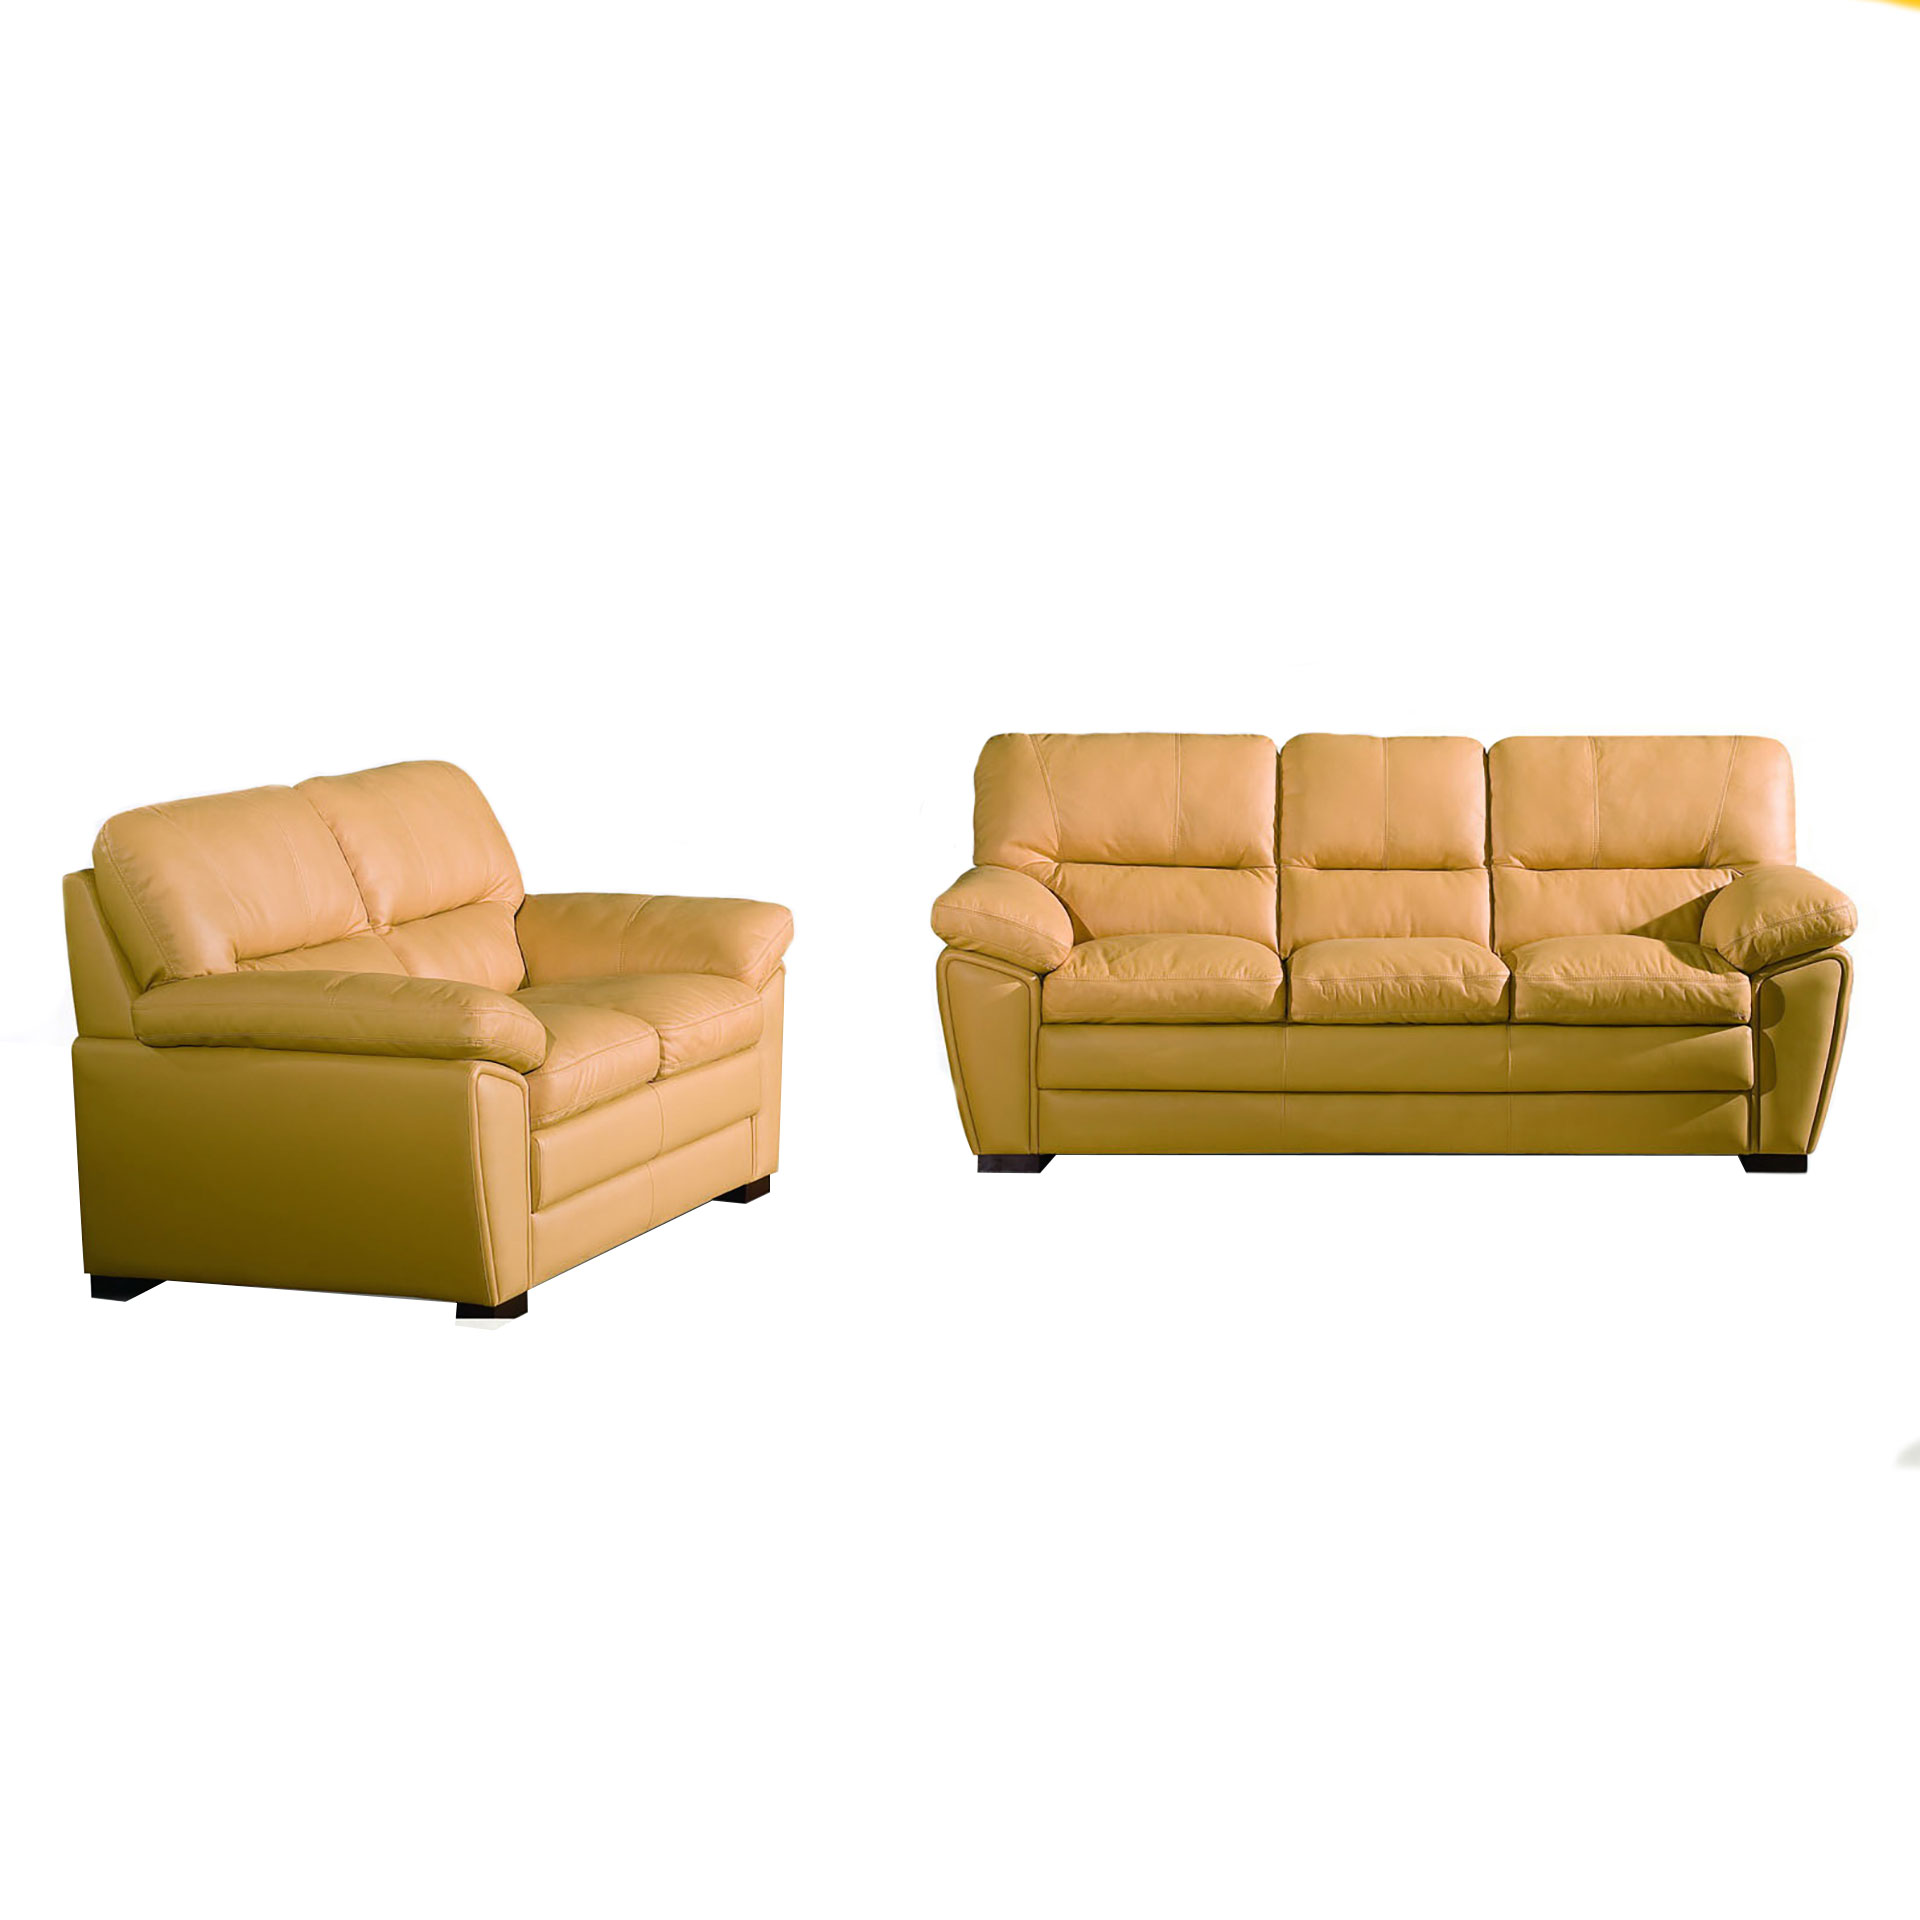 sabrina sofa target market set furniture store manila philippines urban concepts